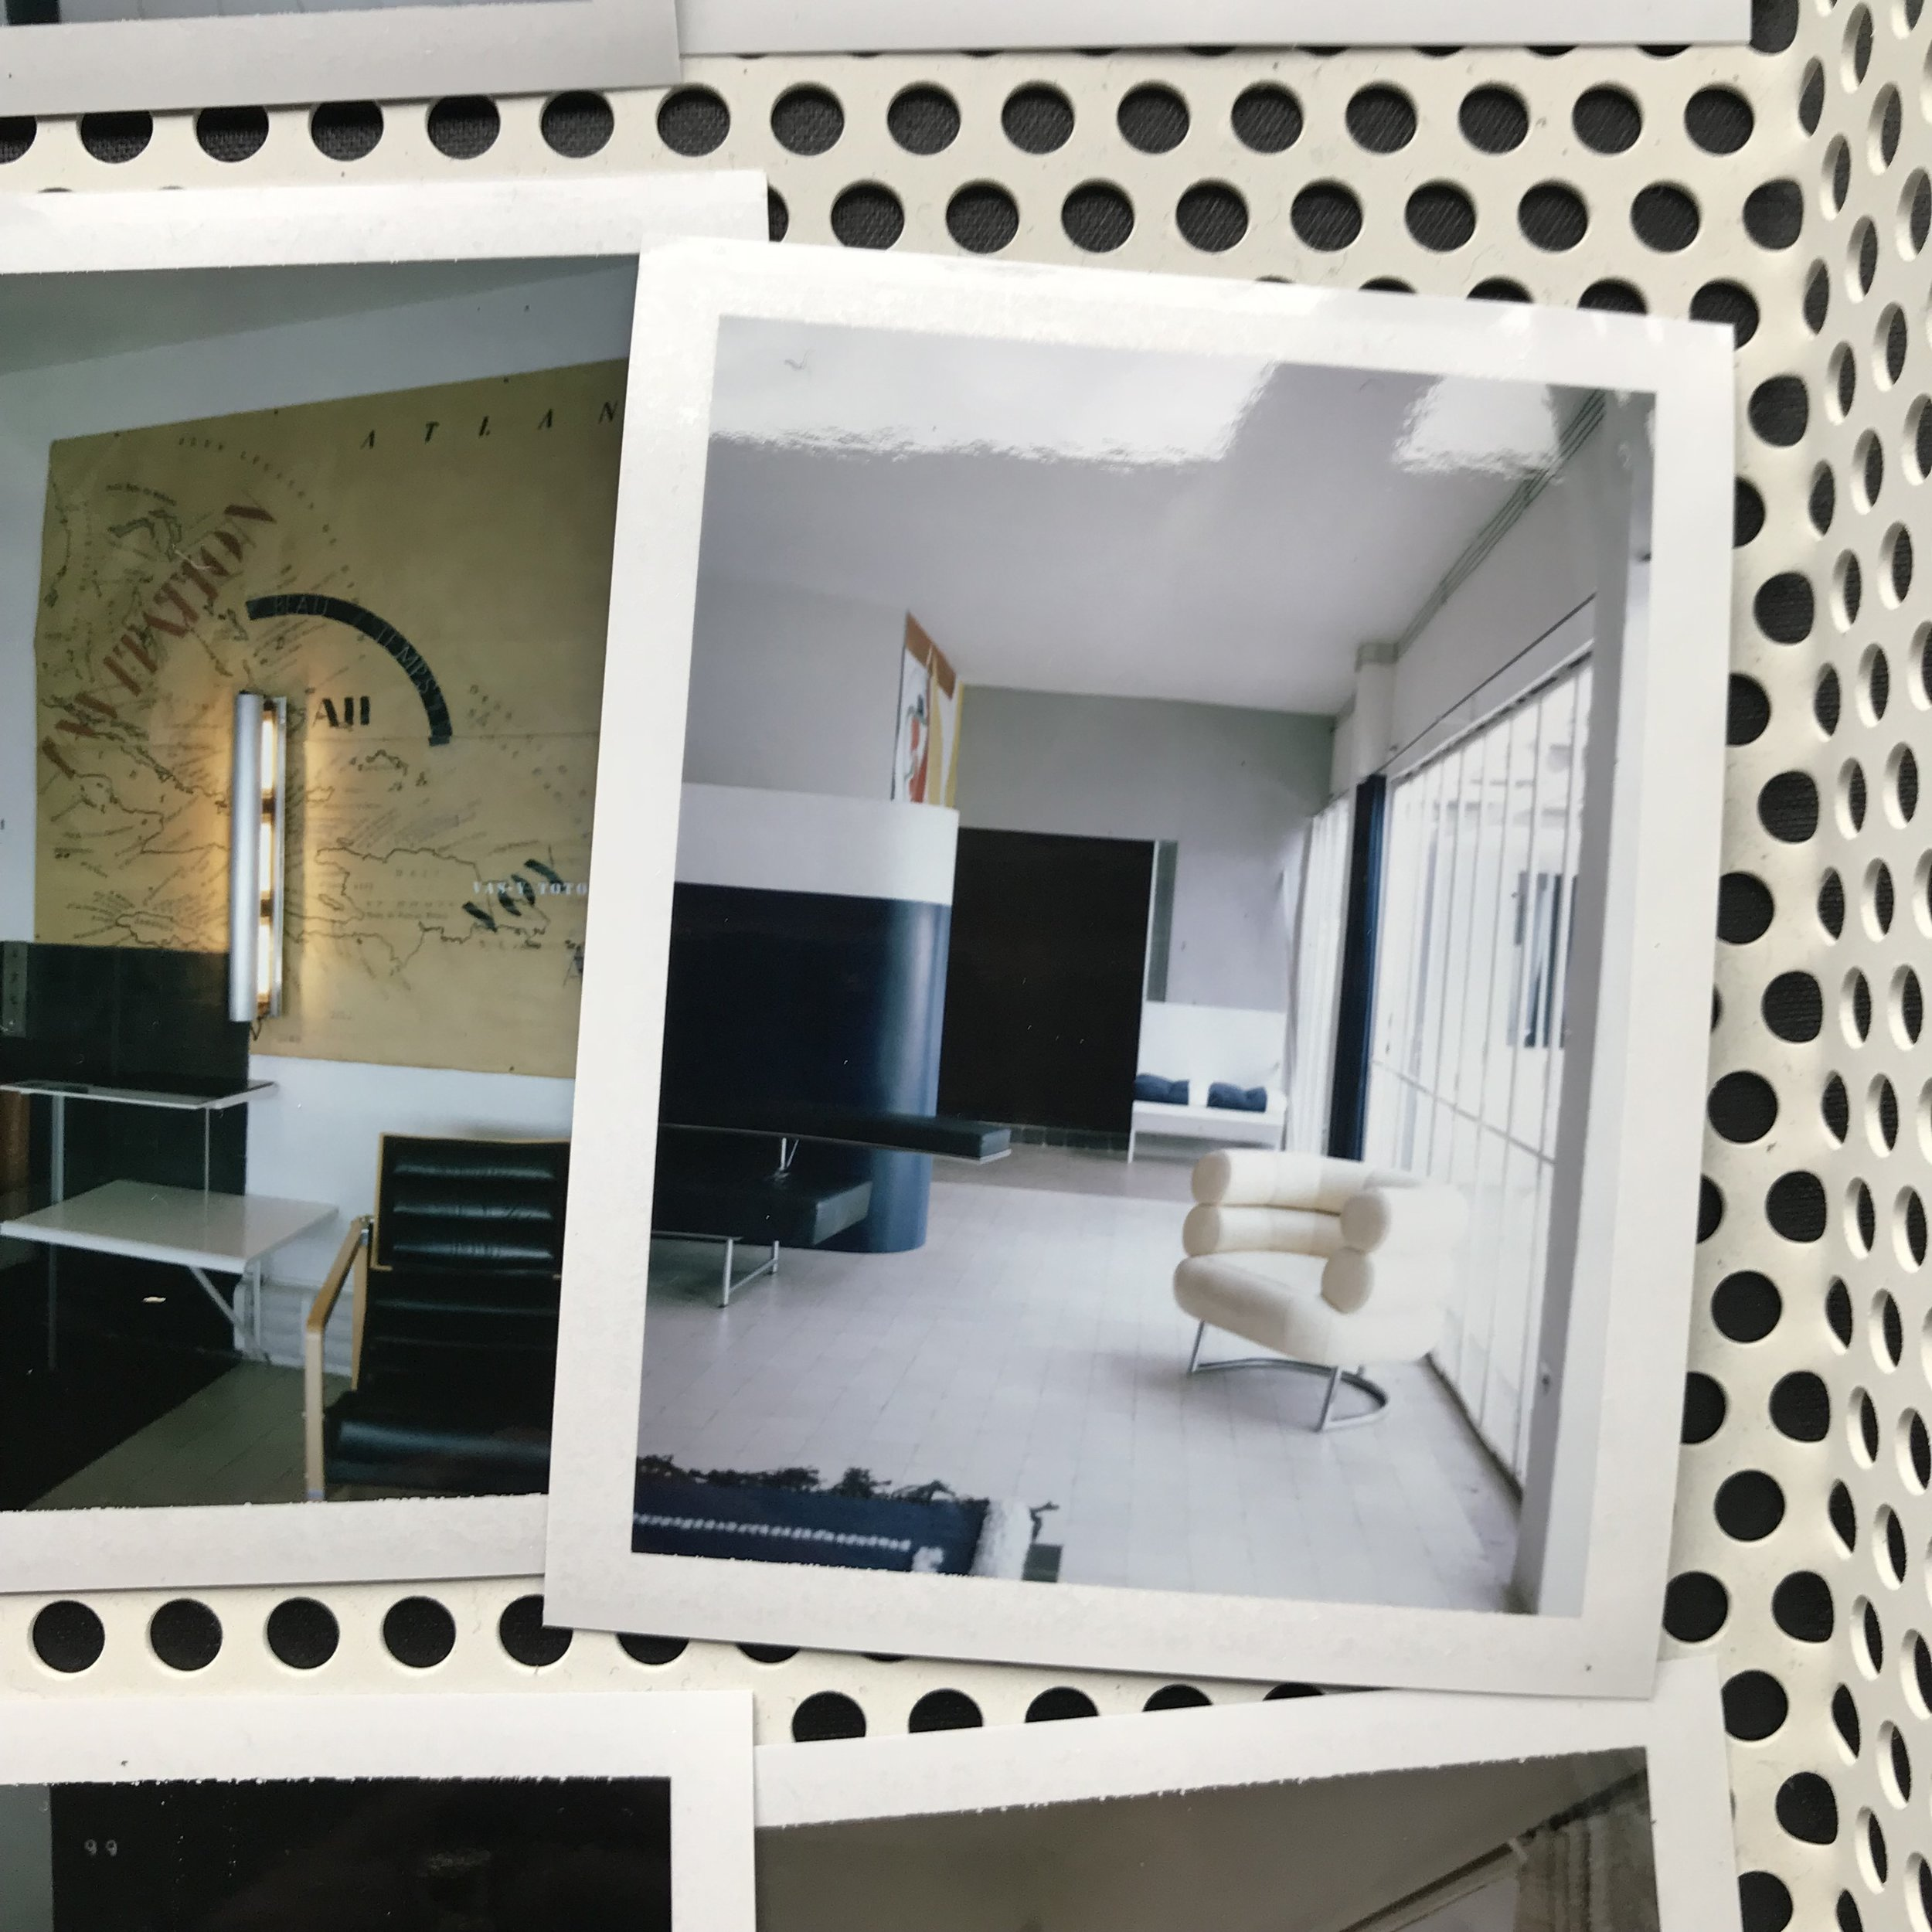 F_Halard Polaroid_E-1027_10.jpg